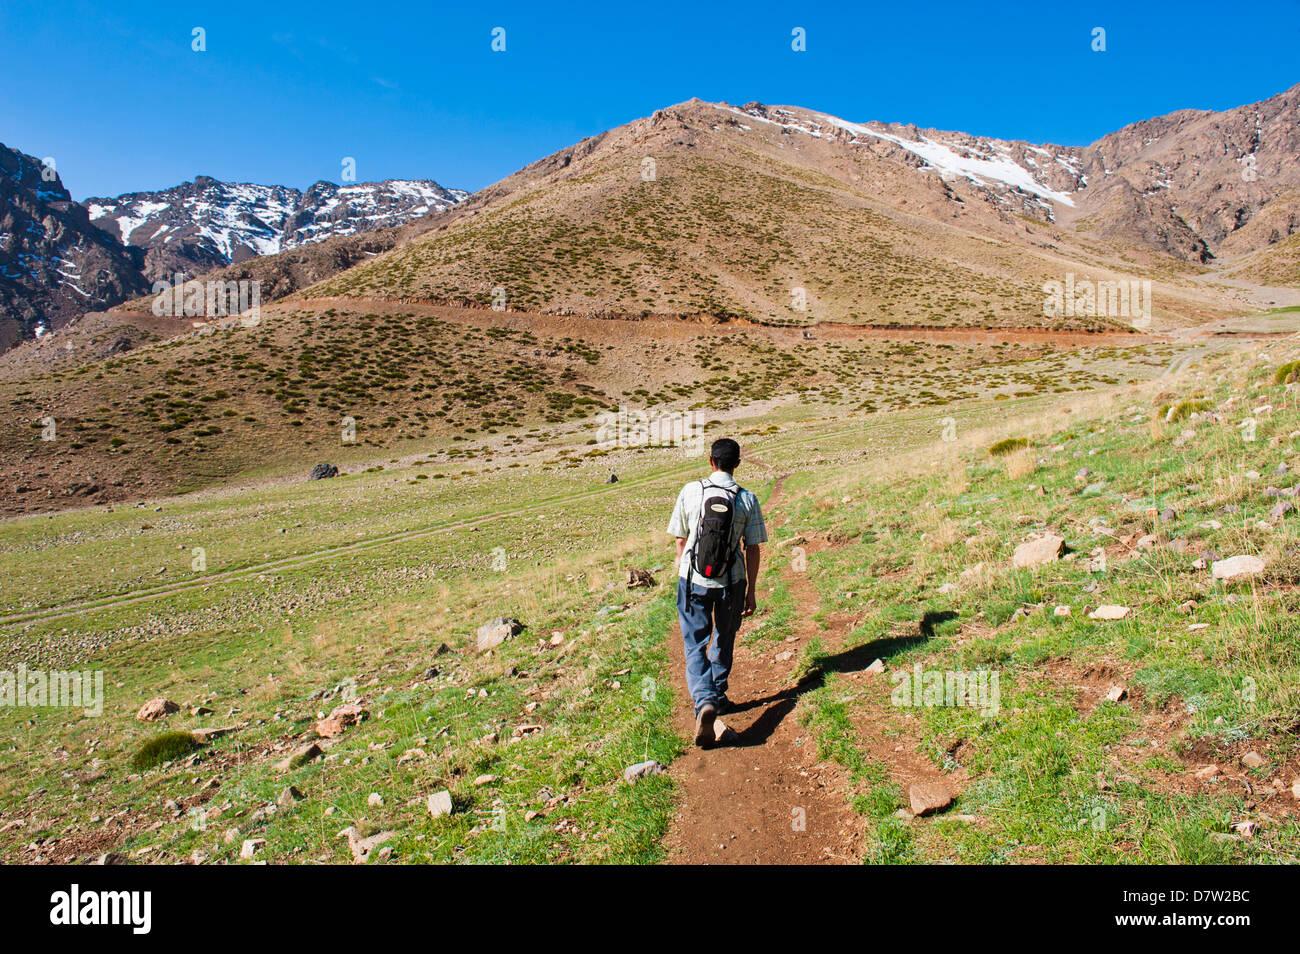 Trekking tour guide walking at Oukaimeden ski resort in summer, High Atlas Mountains, Morocco, North Africa - Stock Image